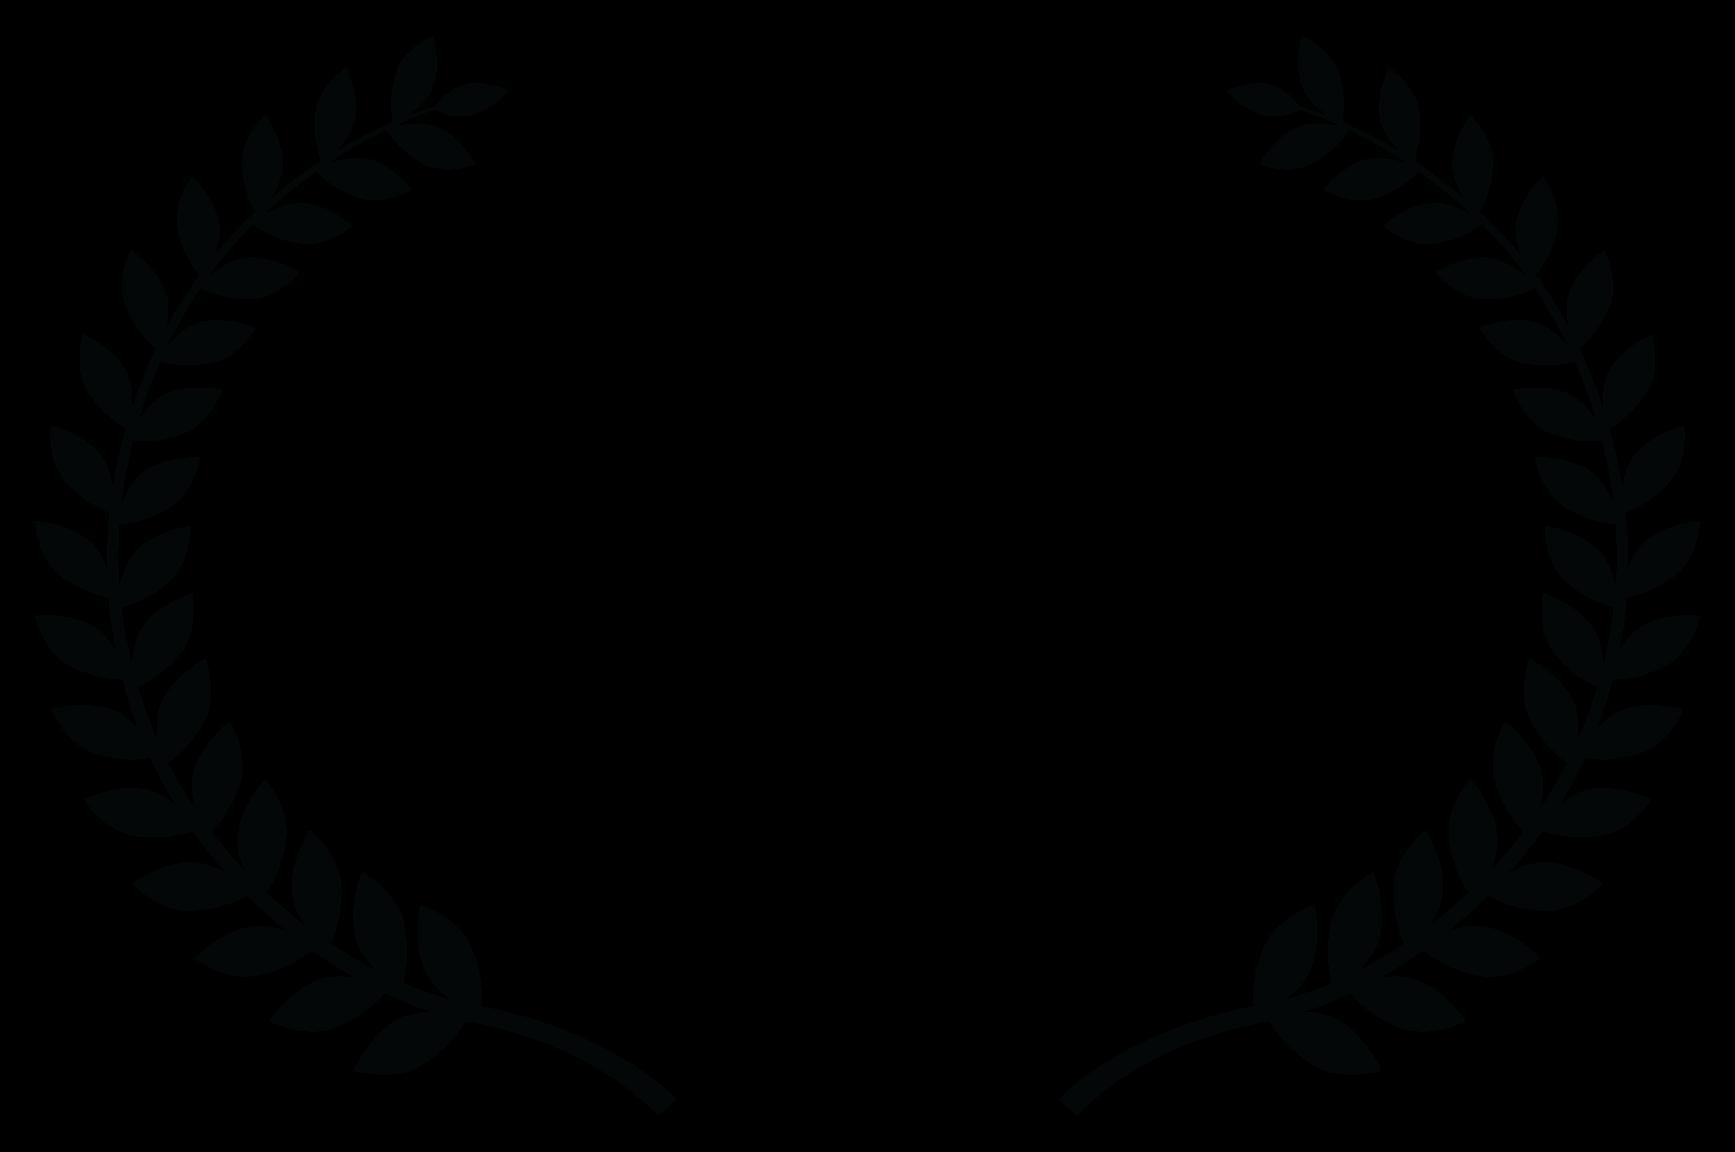 WINNER BEST ACTRESS             MICHELE LYMAN - Los Angeles Film Awards - 2017.png